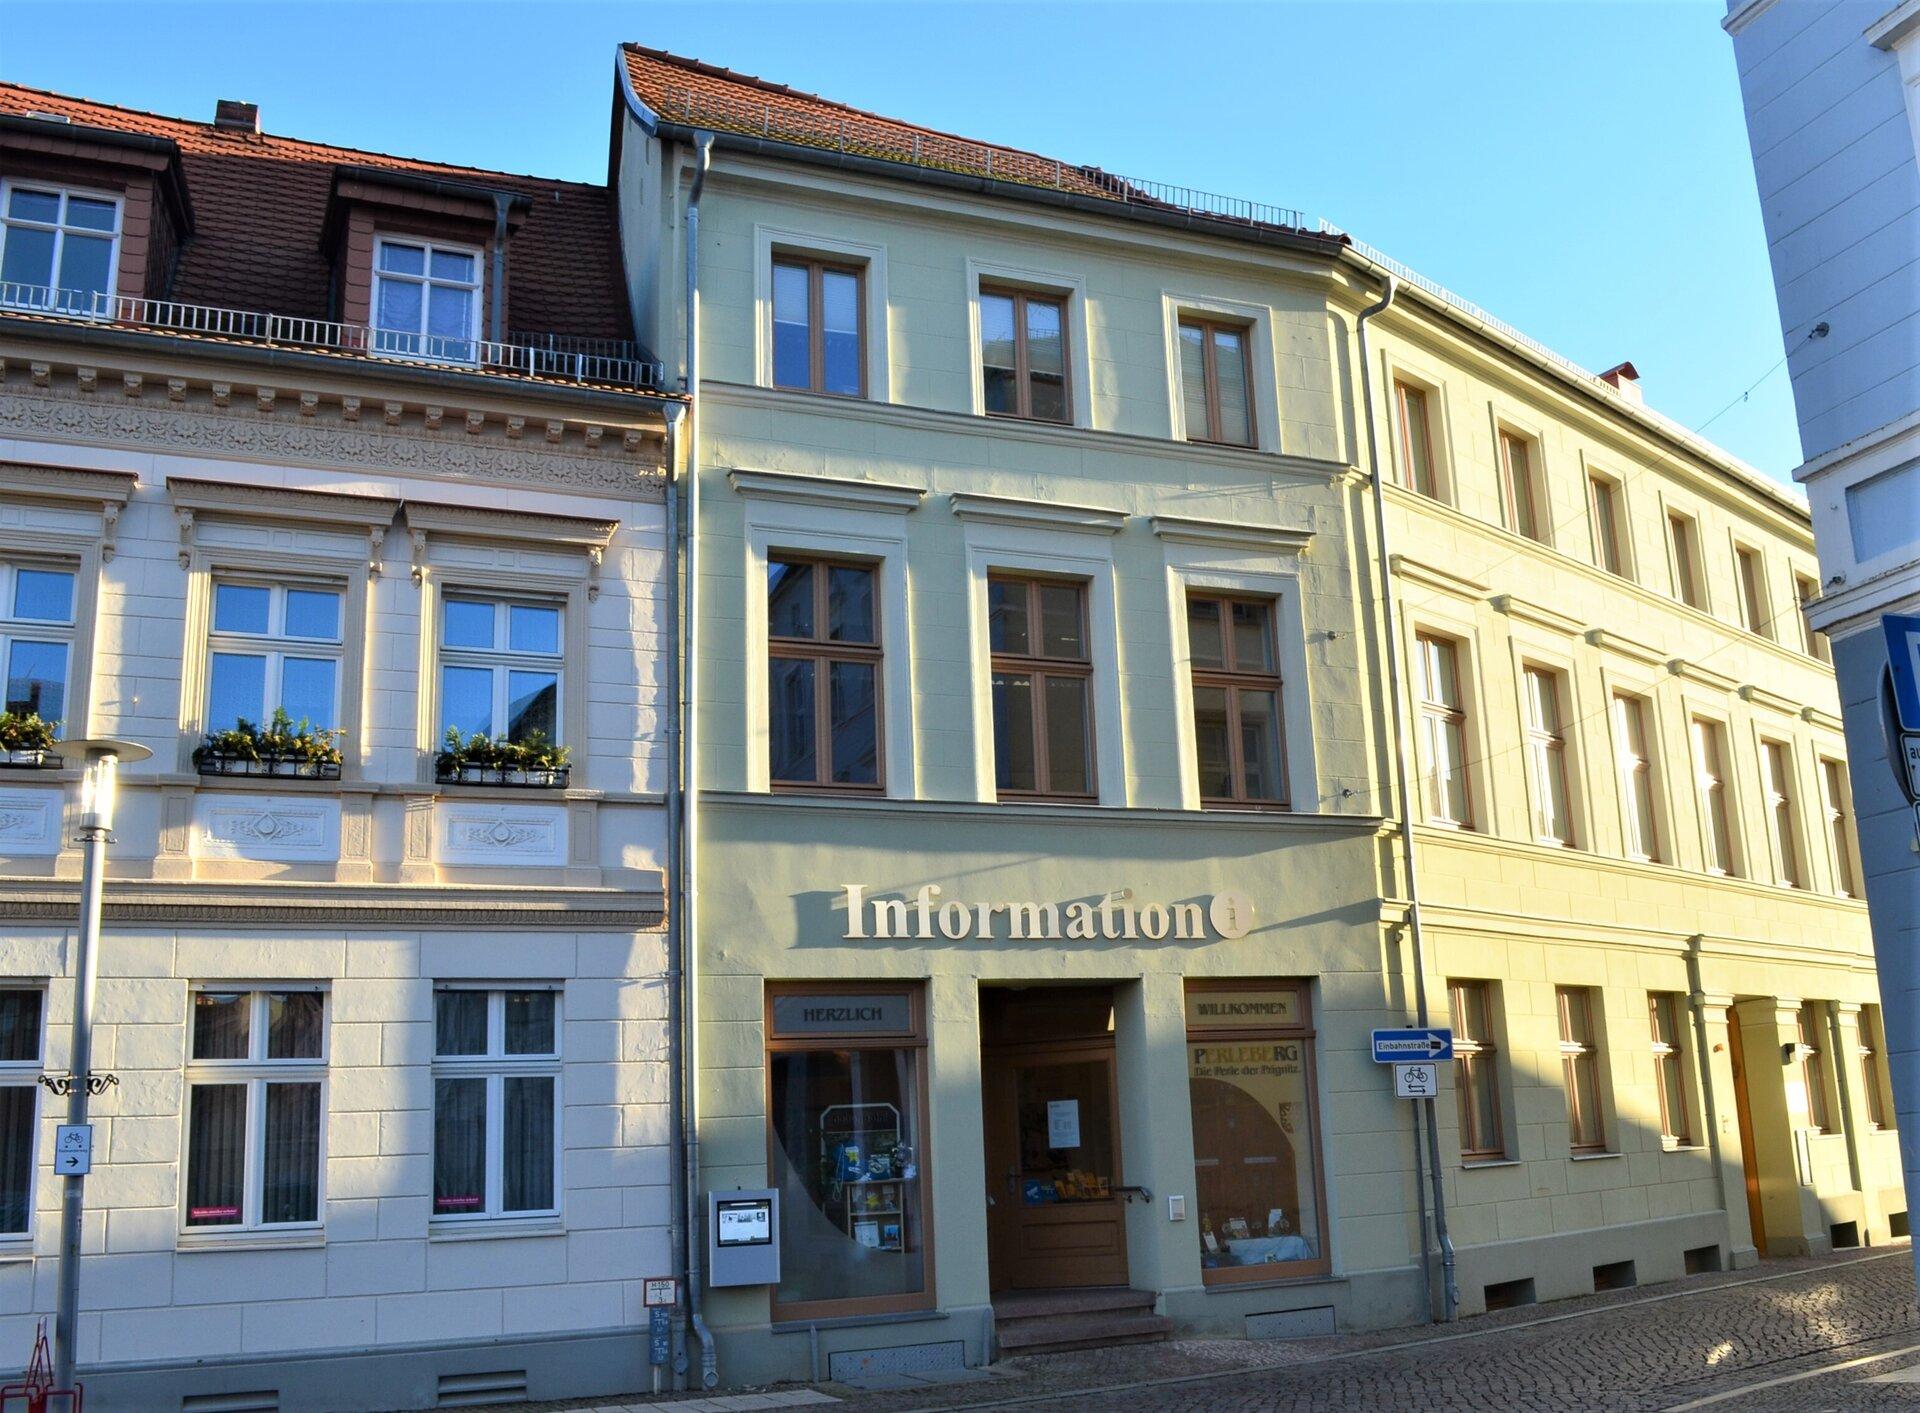 Eingang Stadtinformation Perleberg